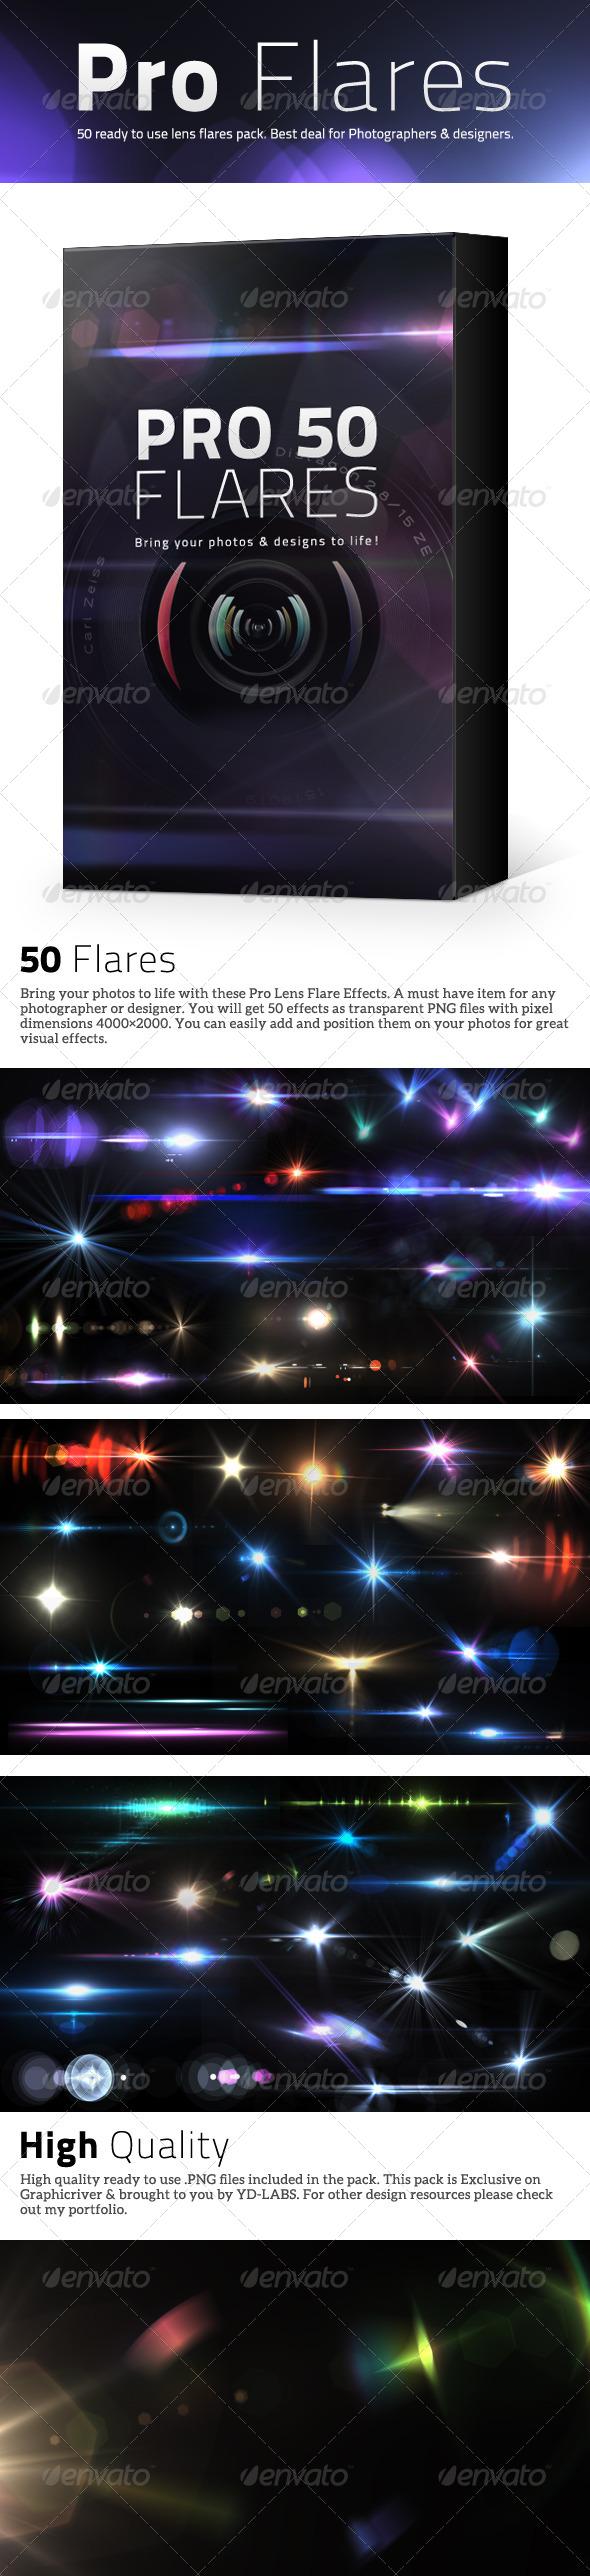 GraphicRiver 50 Pro Lens Flares V2 5258741